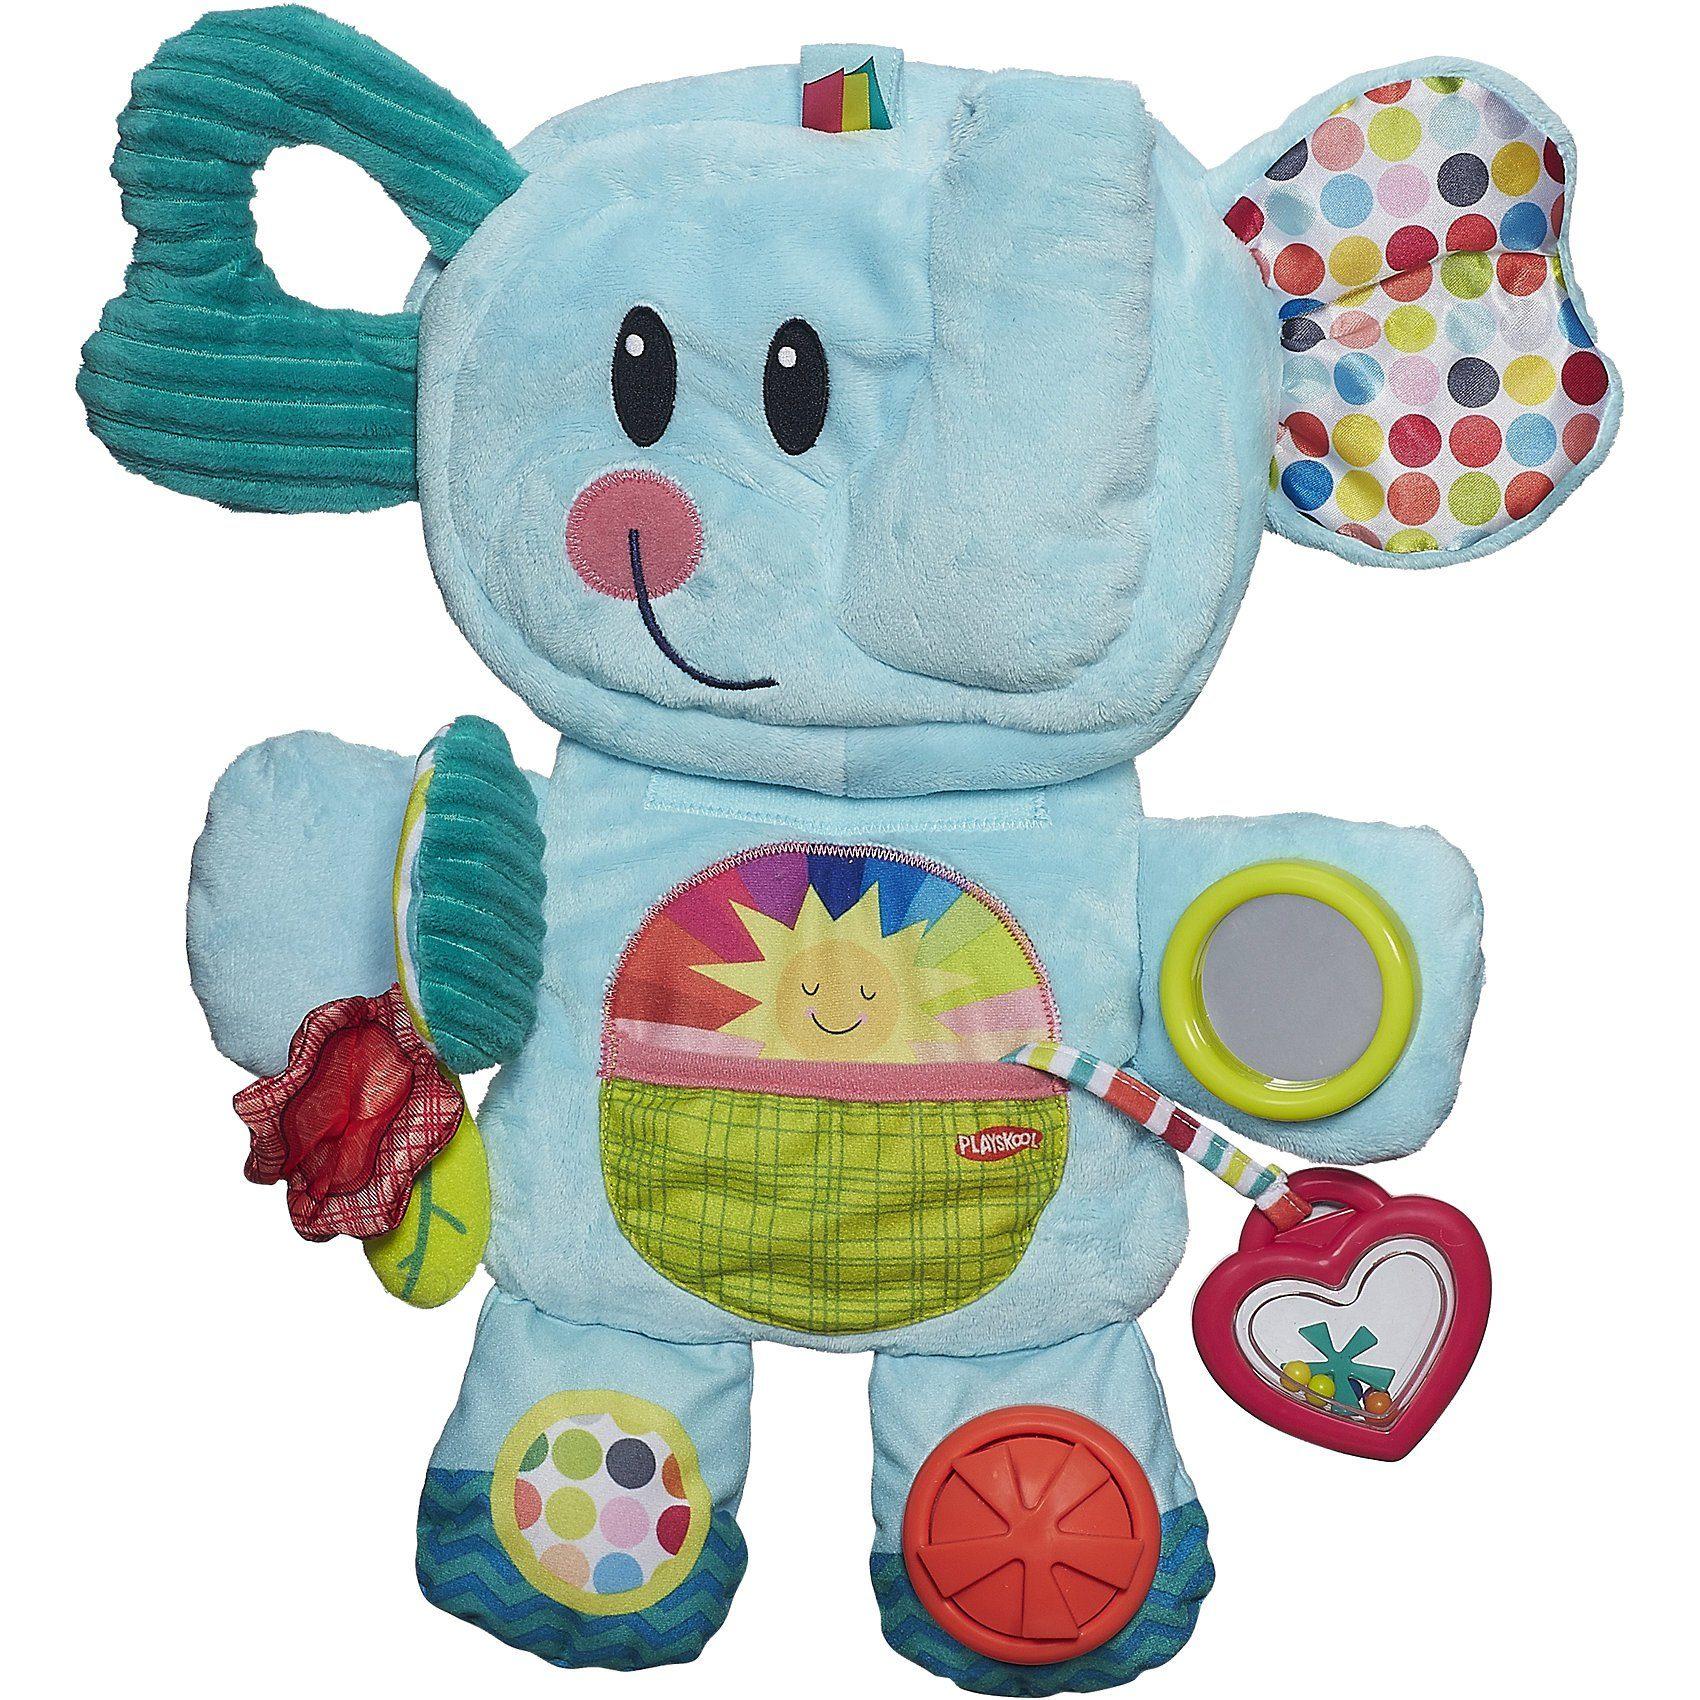 Hasbro Playskool - Lebhafter Elefant, faltbar